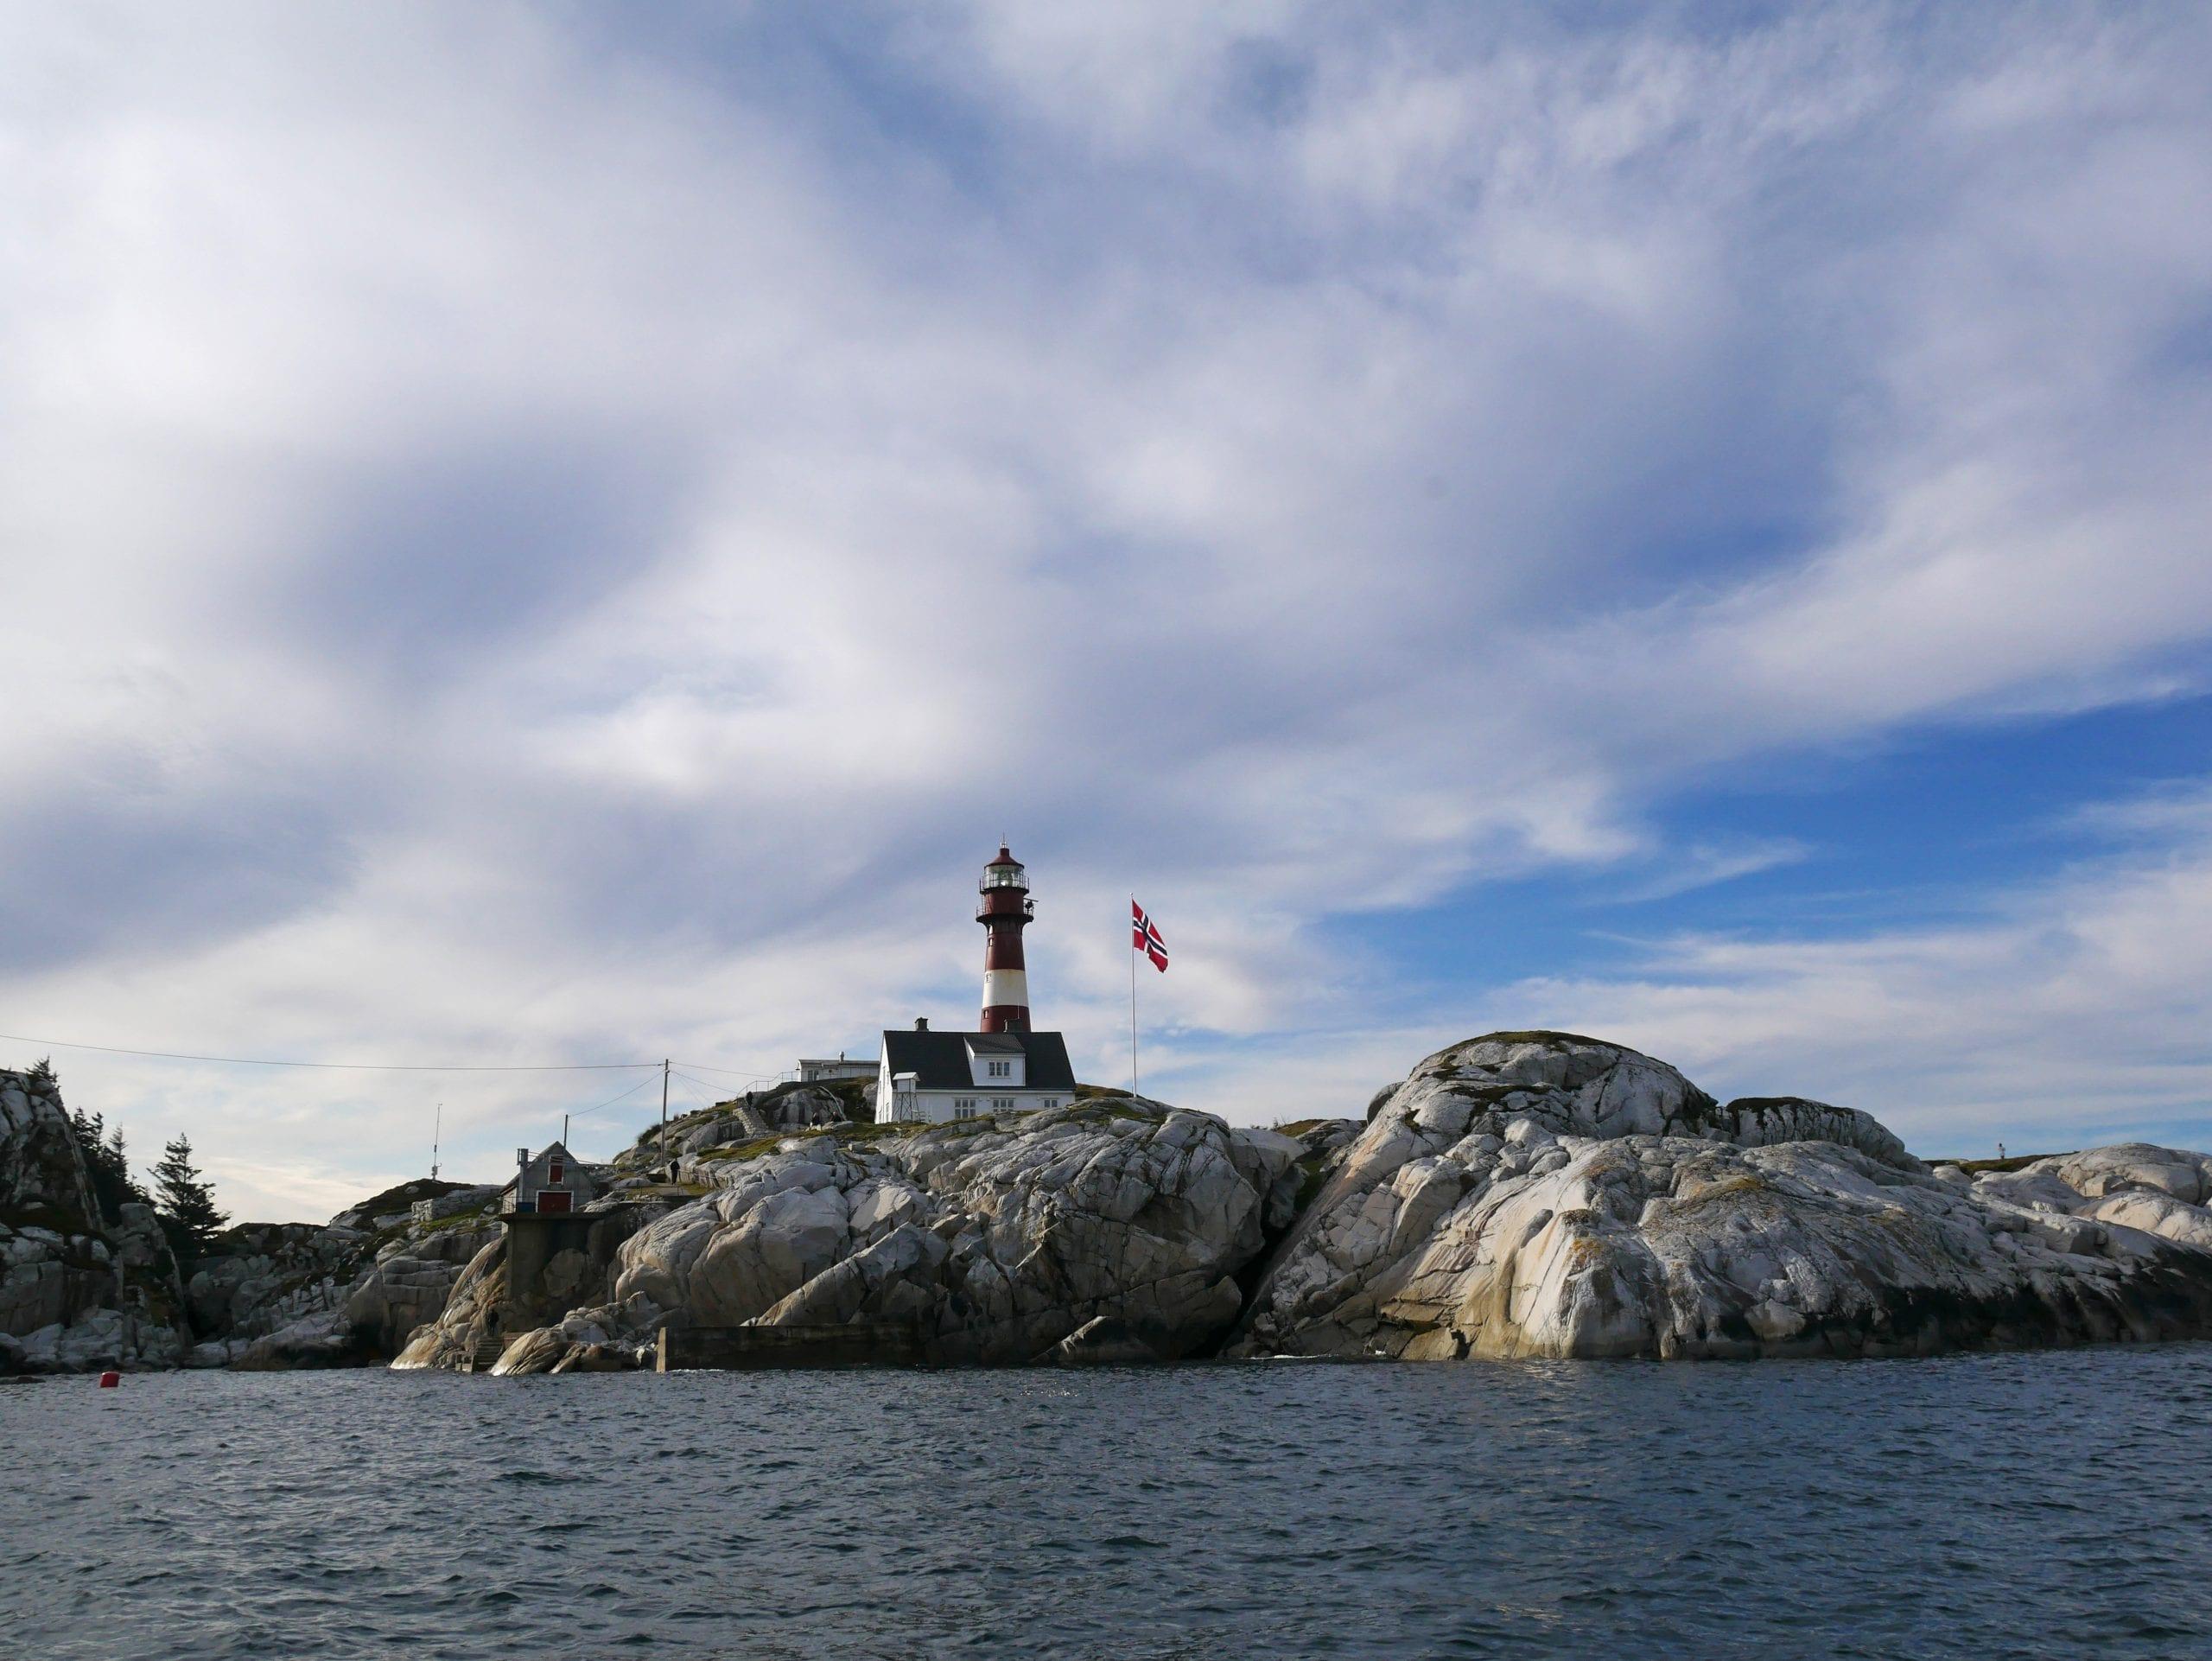 Slåtterøy Fyr, øye til øy, Stord folkehøgskule